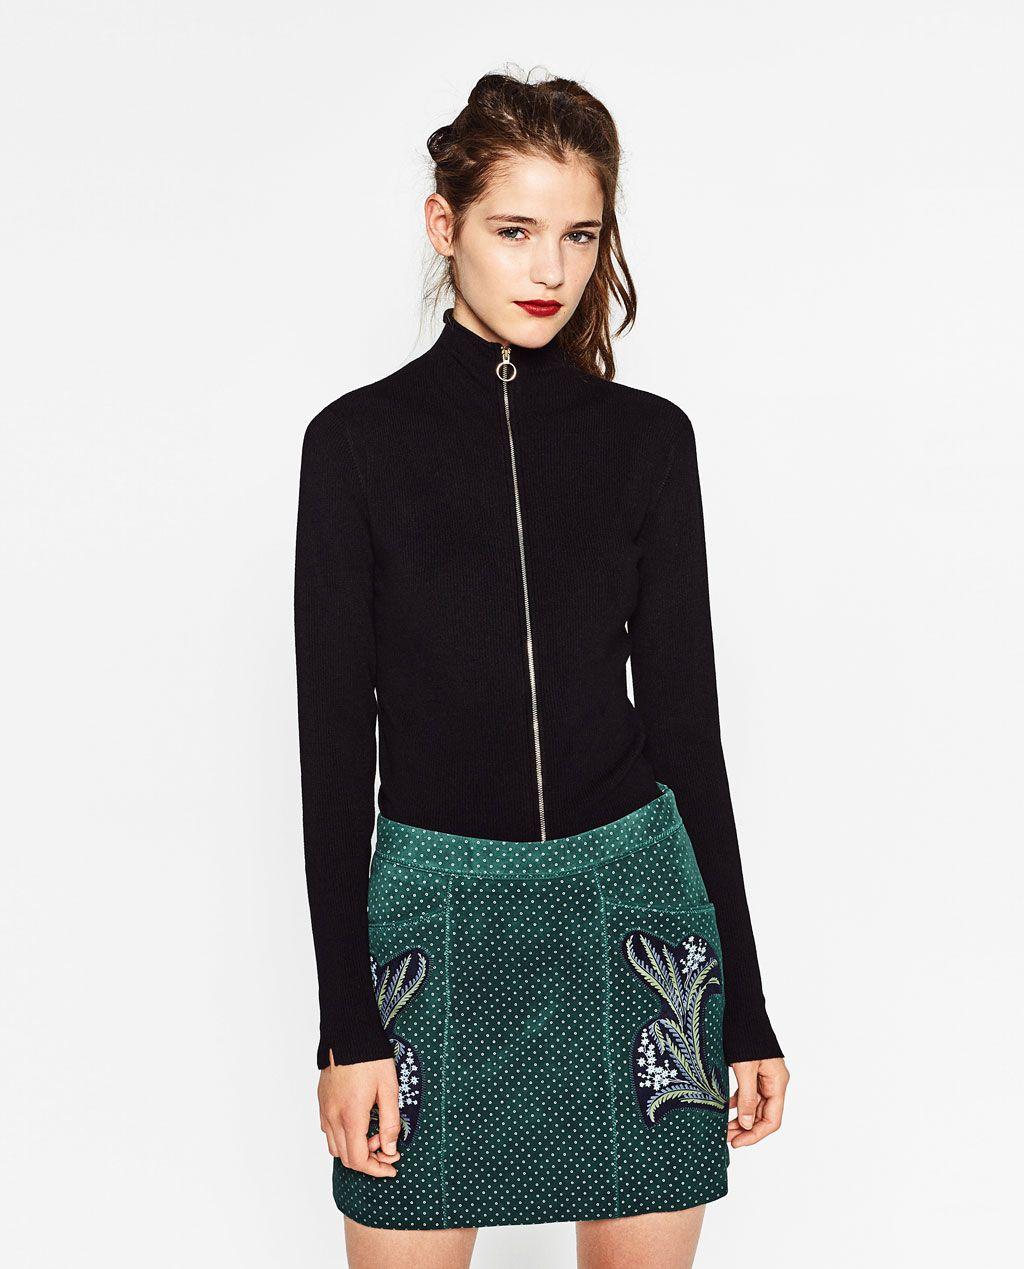 2e5cd288 RIBBED CARDIGAN from Zara Zara Women, My Wardrobe, Sequin Skirt, Knitwear,  Jacket